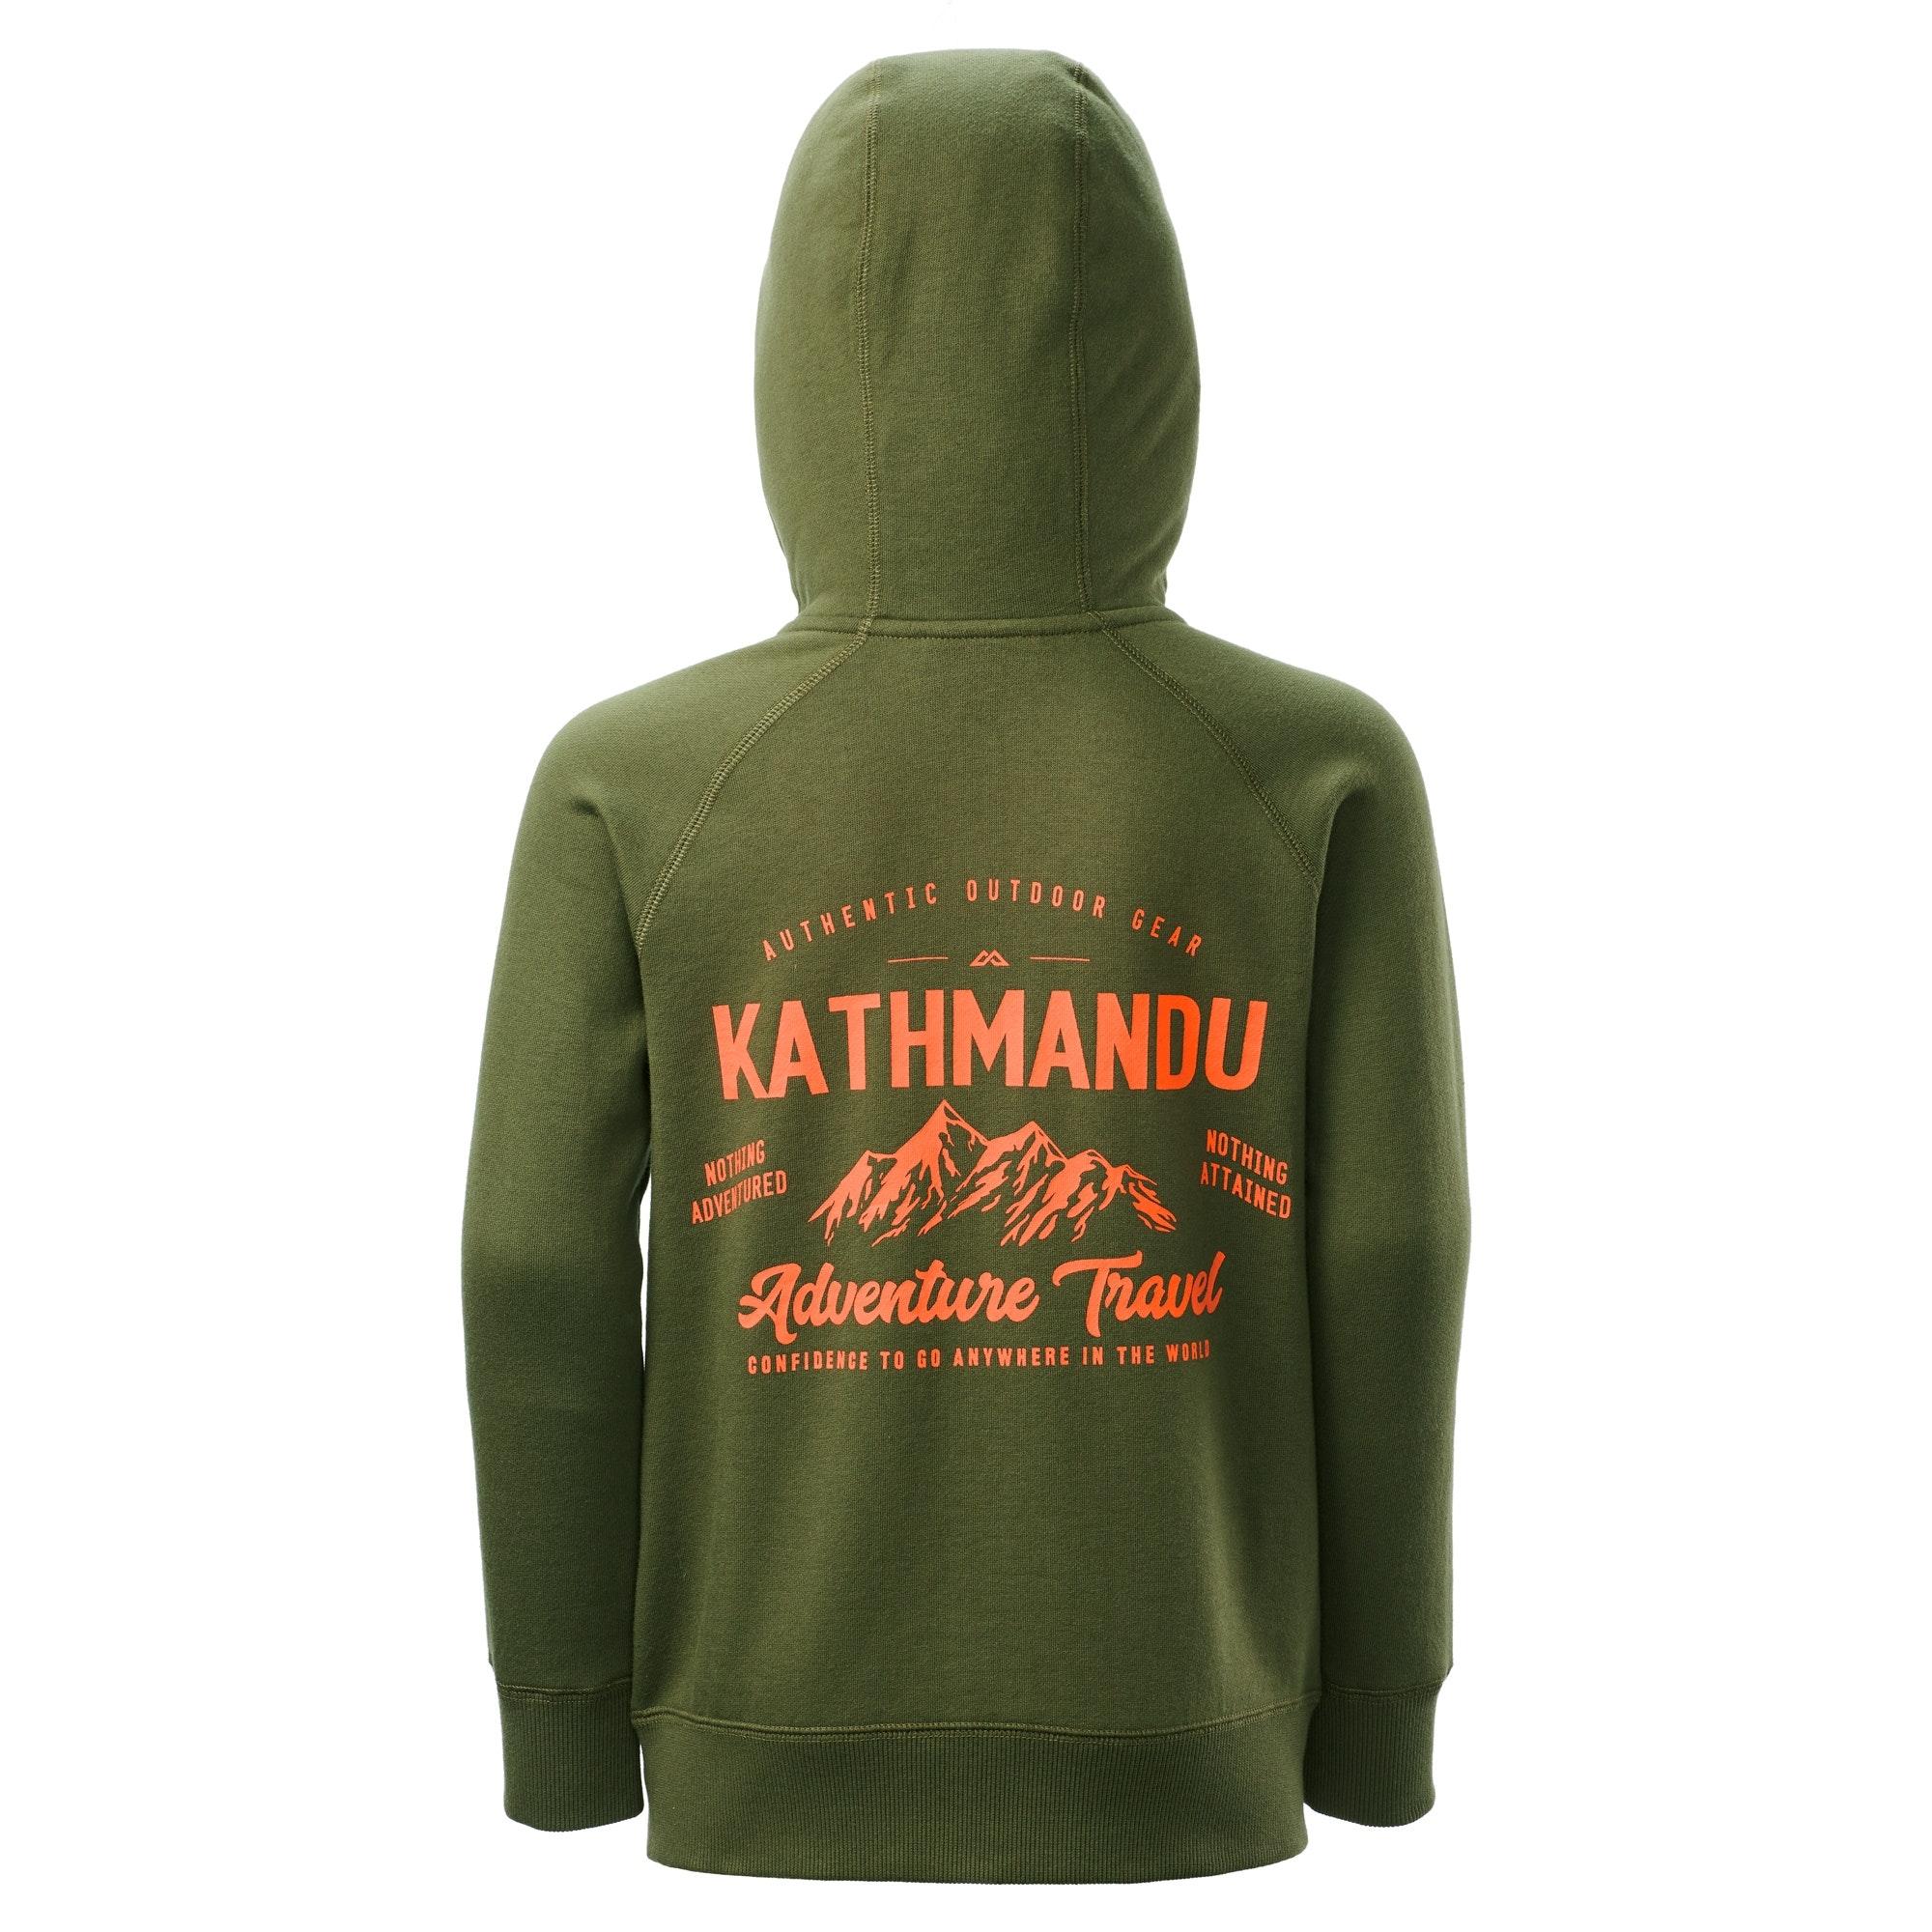 NEW-Kathmandu-Youth-Boy-039-s-Girl-039-s-Full-Zip-Hooded-Winter-Warm-Fleece-Jacket thumbnail 13